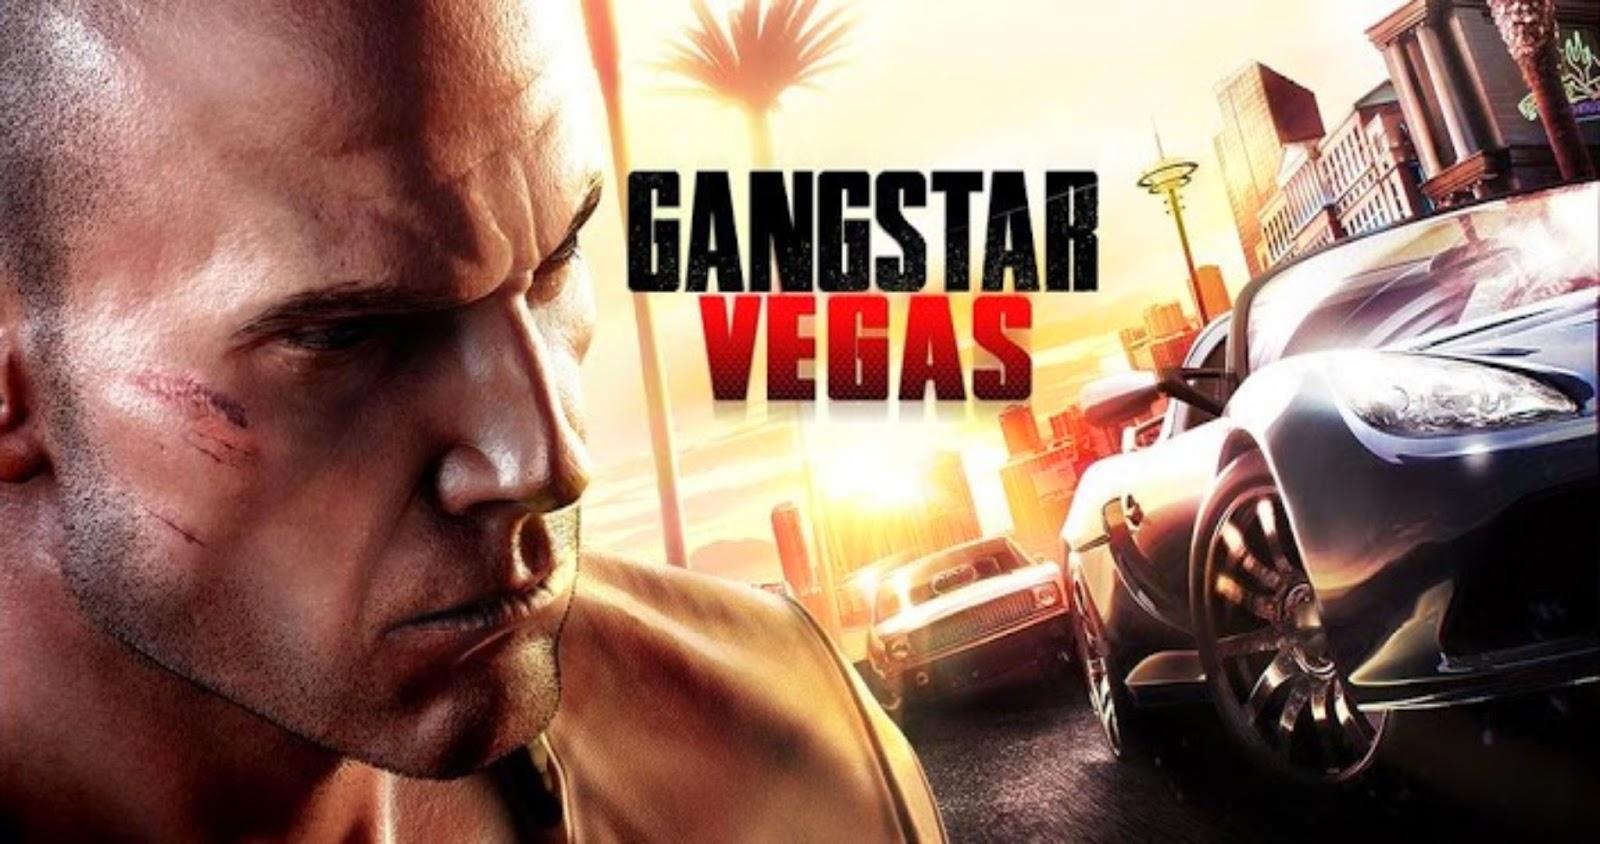 Gangster Las Vegas 4